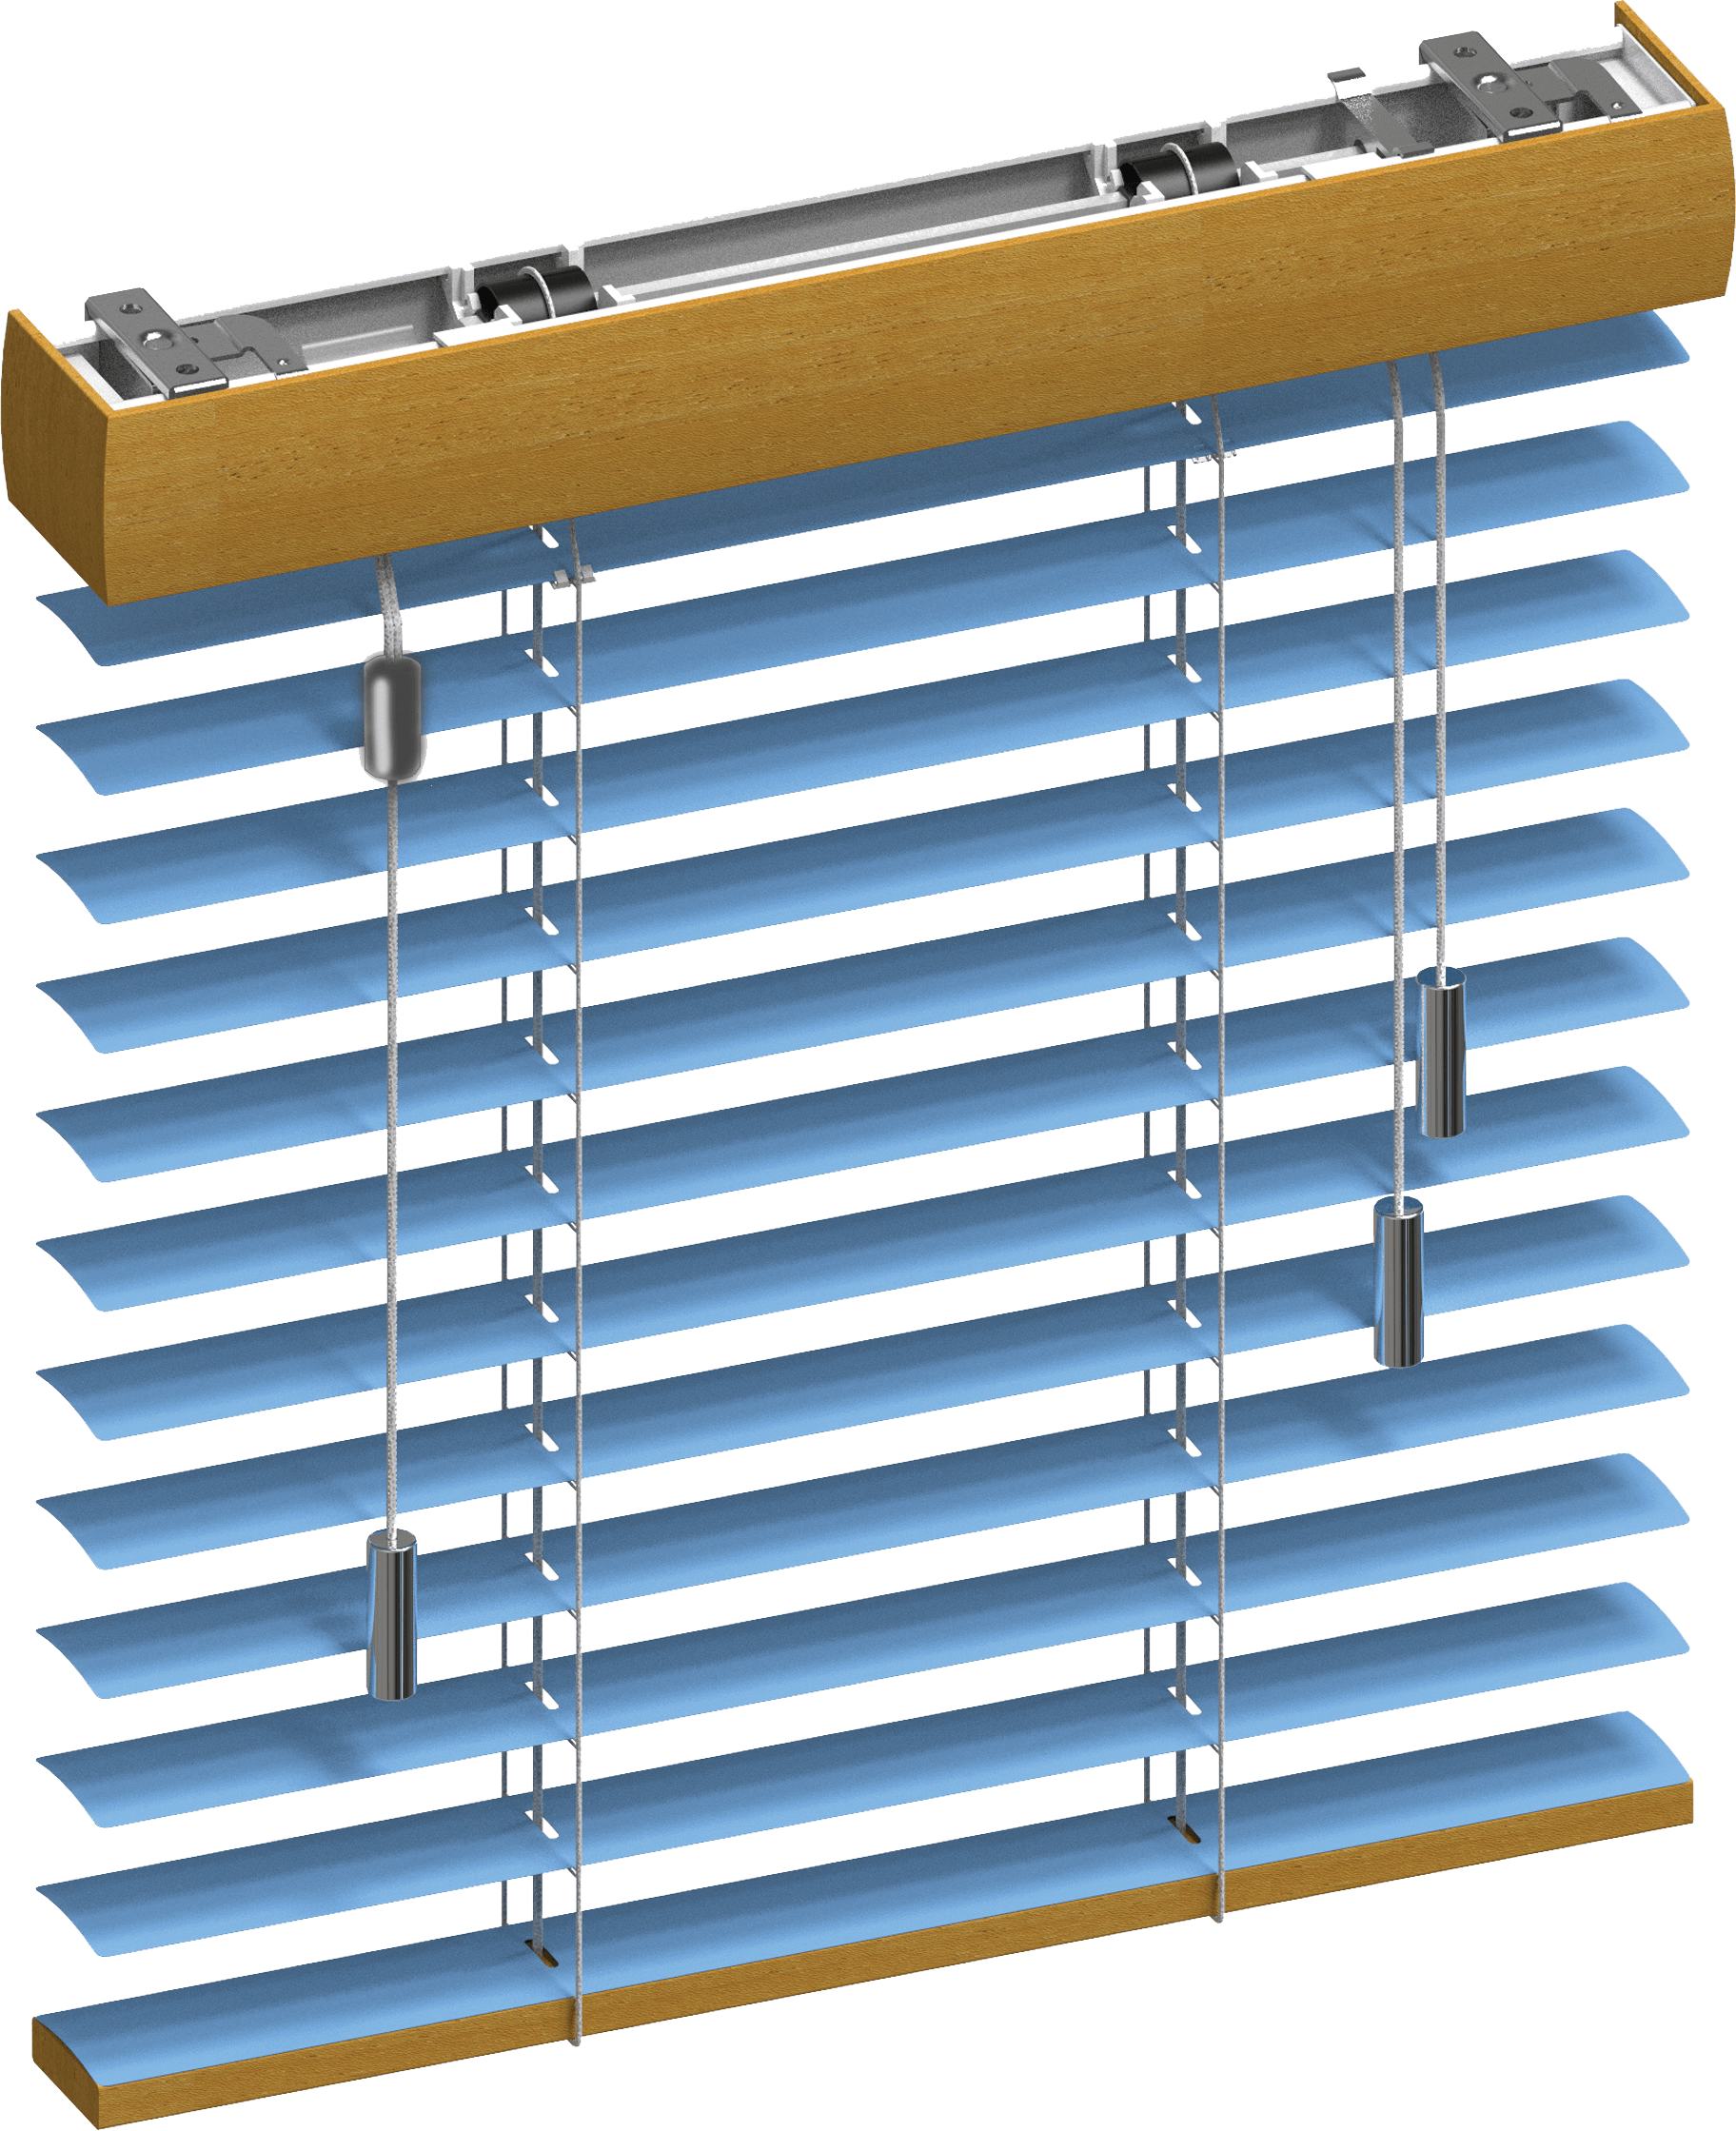 sistema-tradizionale-legno-e-alluminio-wood-and-aluminium-venetian-blinds